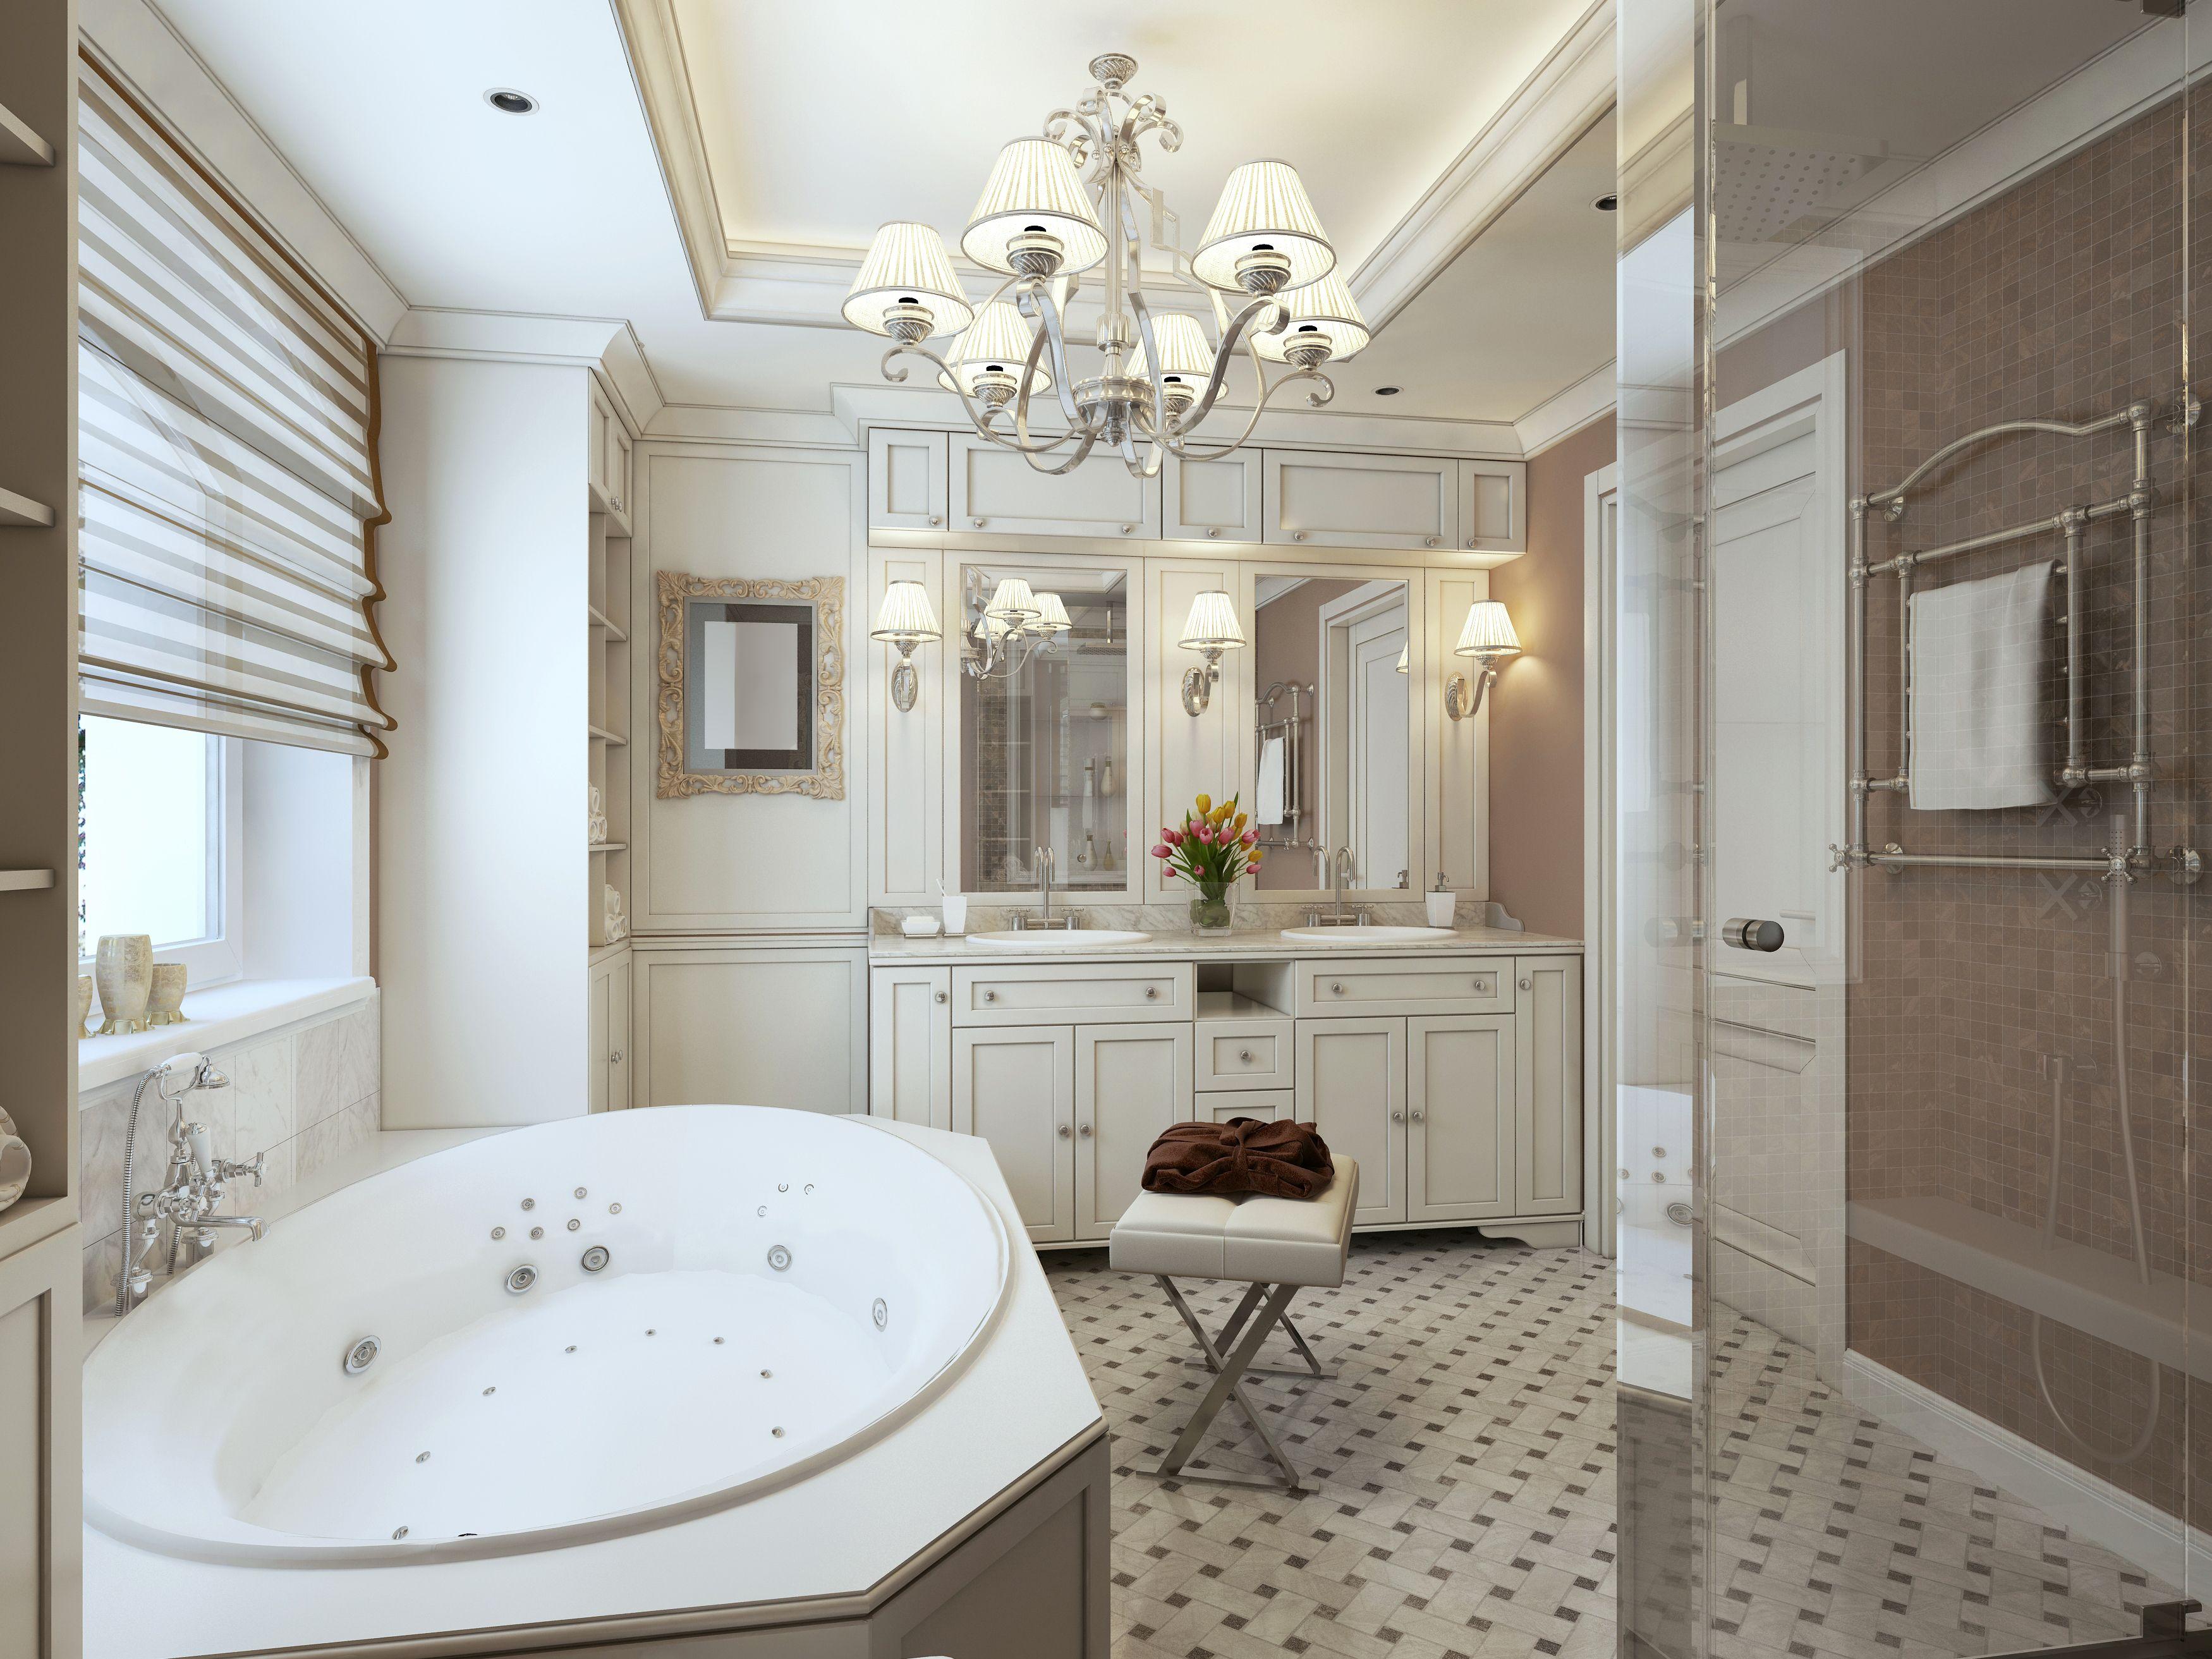 Explore White Bathroom Furniture, Big Bathtub, And More